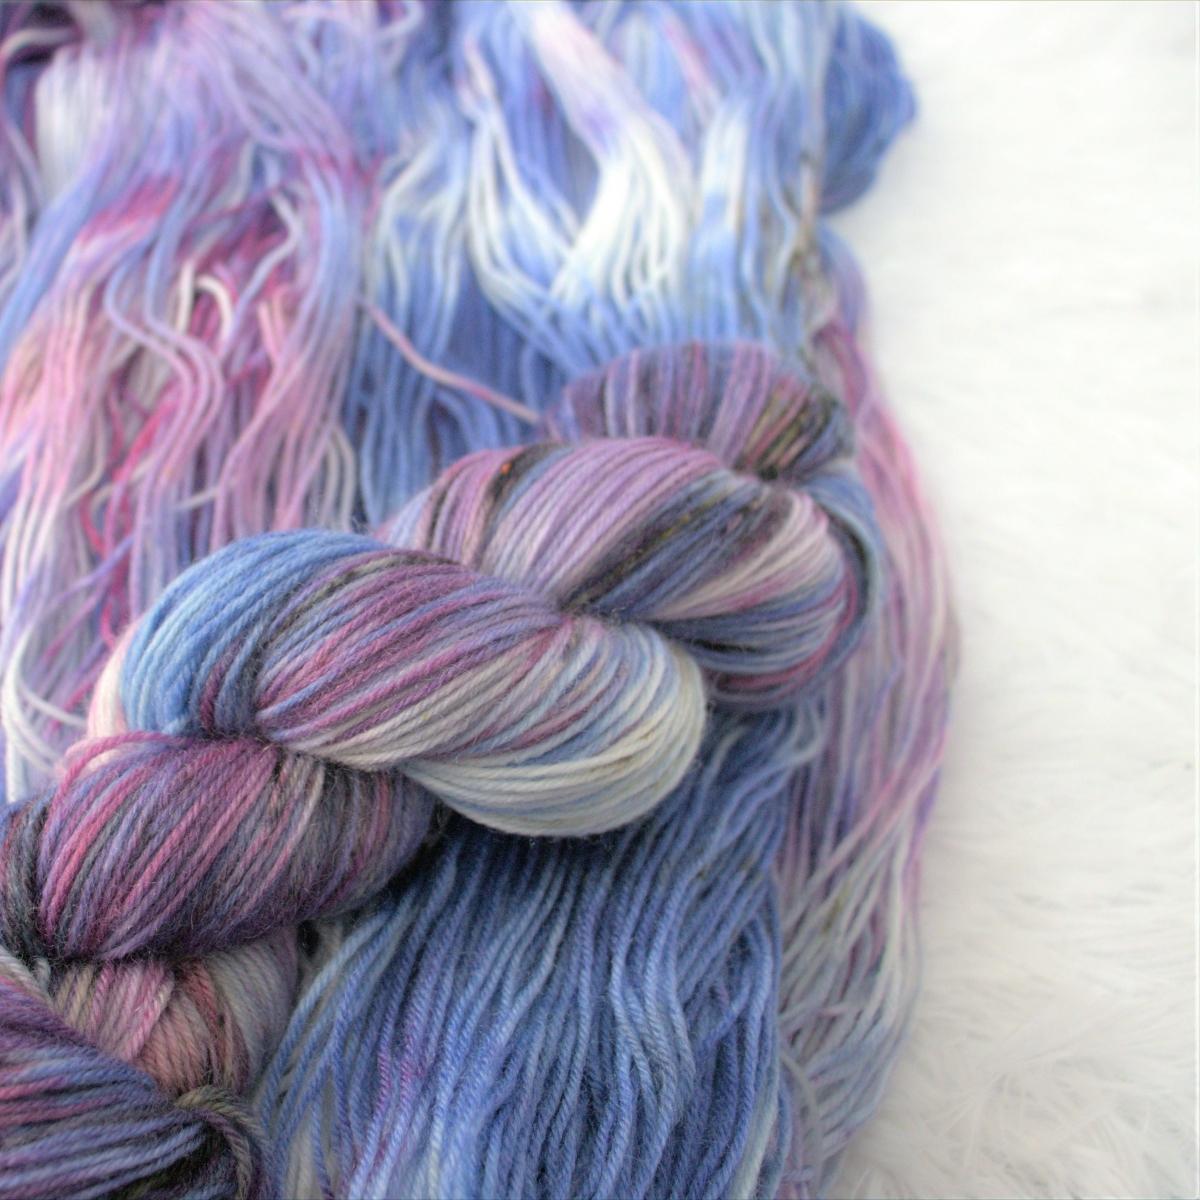 woodico.pro hand dyed yarn 043 1200x1200 - Hand dyed yarn / 043